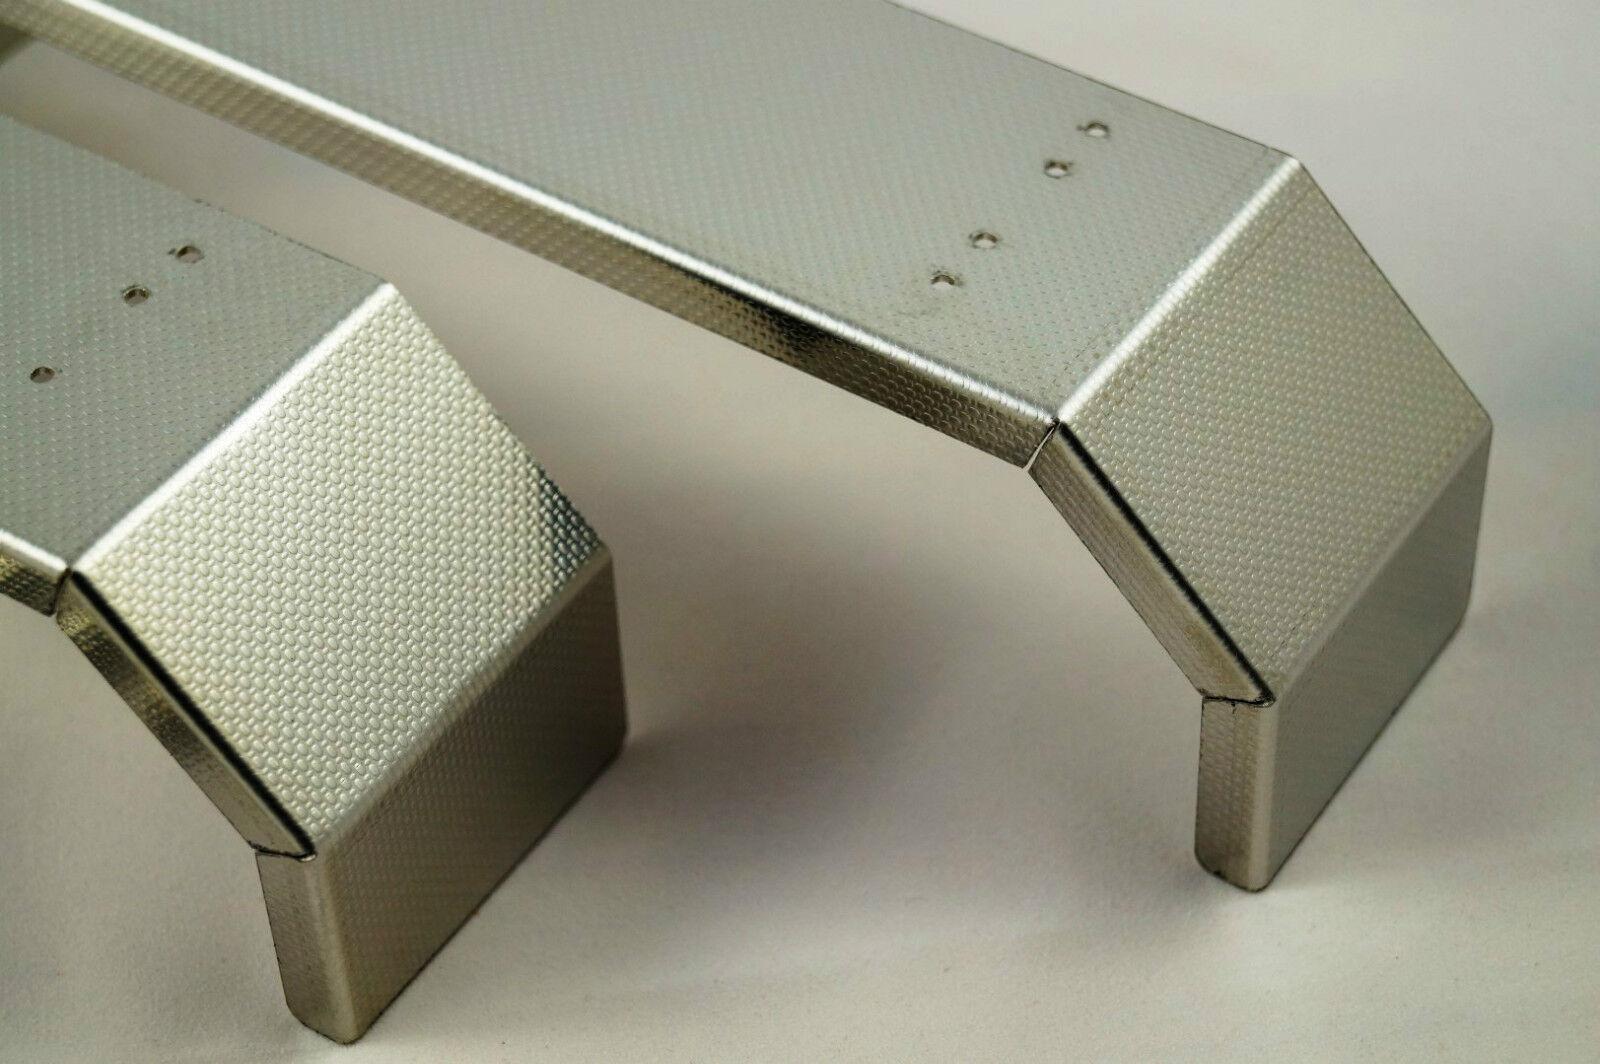 1/14 PARAFANGO per 4 asse per TAMIYA CAMION chassis-INOX